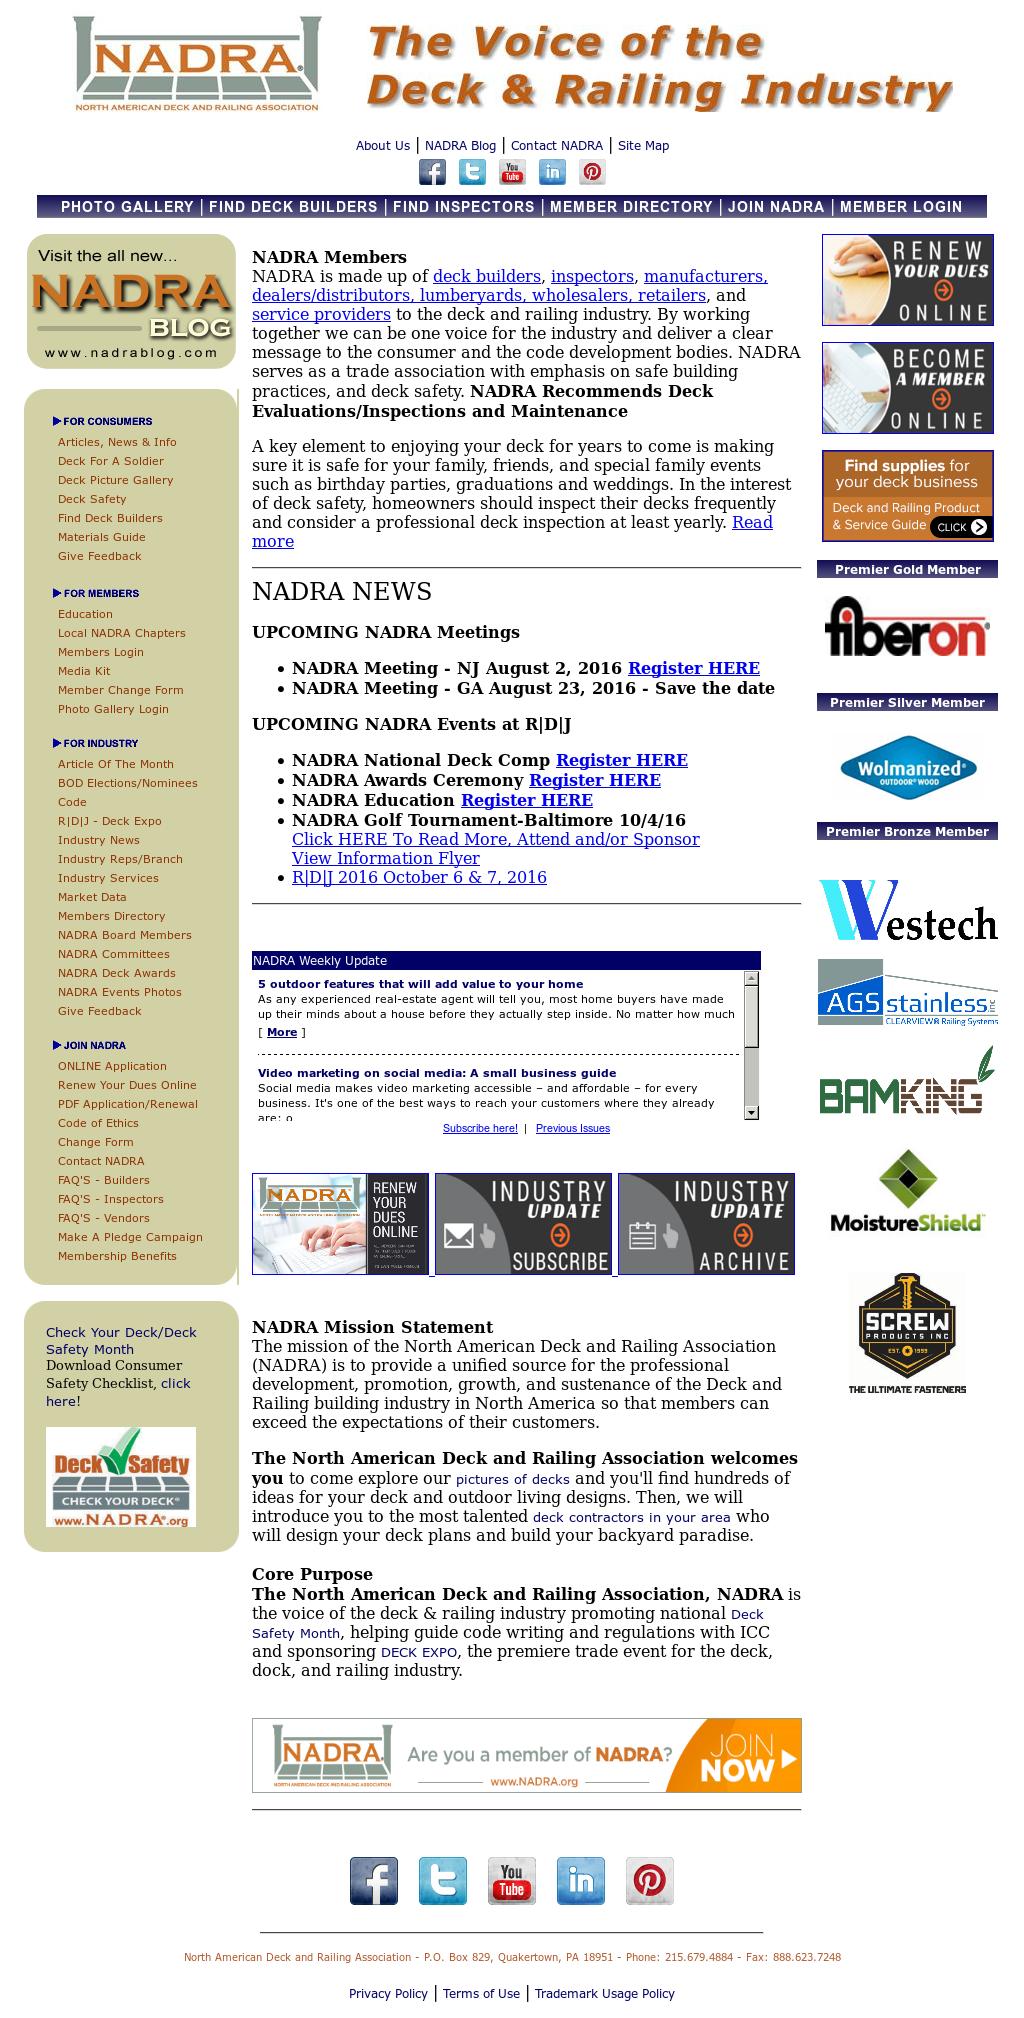 Owler Reports - Press Release: Nadra : Hanley Wood Announced